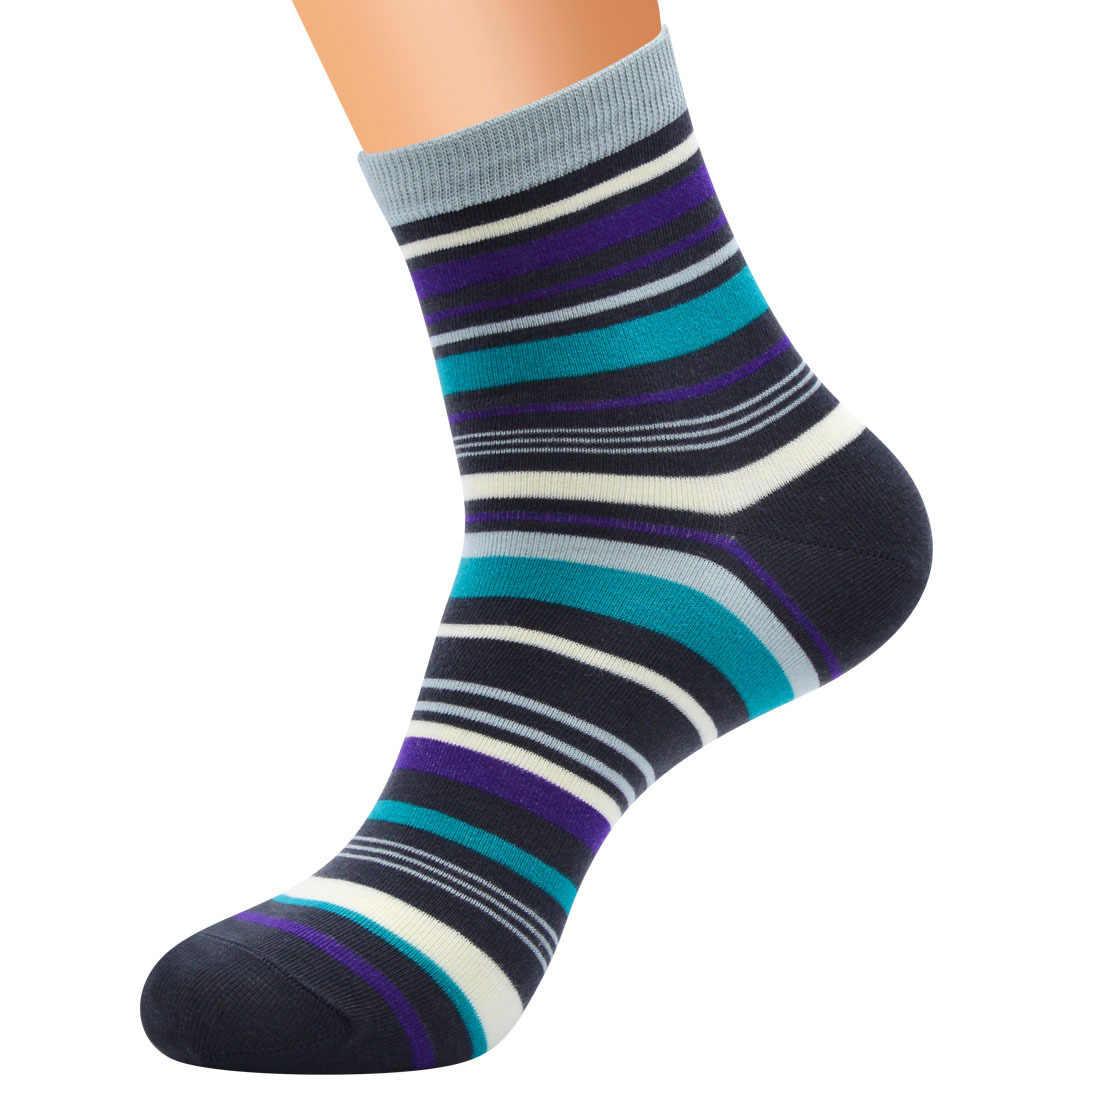 PEONFLY ลายถุงเท้าผู้ชายตลกสั้นผ้าฝ้าย Sokken วิทยาลัยถุงเท้า Motion Happy ถุงเท้า